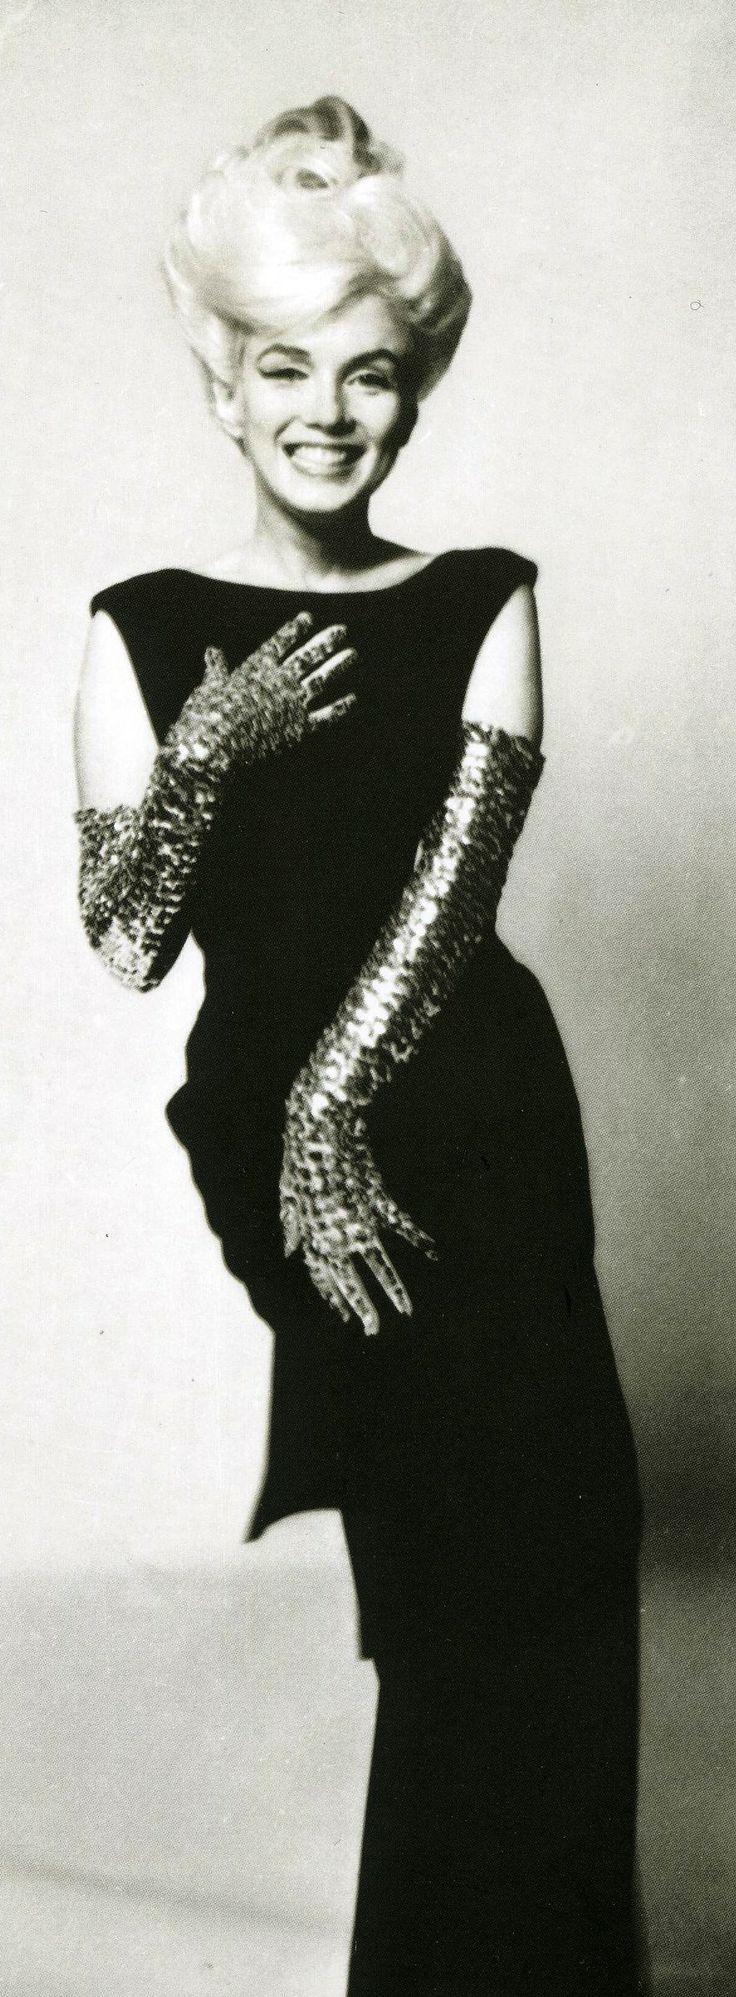 Marilyn Monroe photographed by Bert Stern, 1962. Veja também…